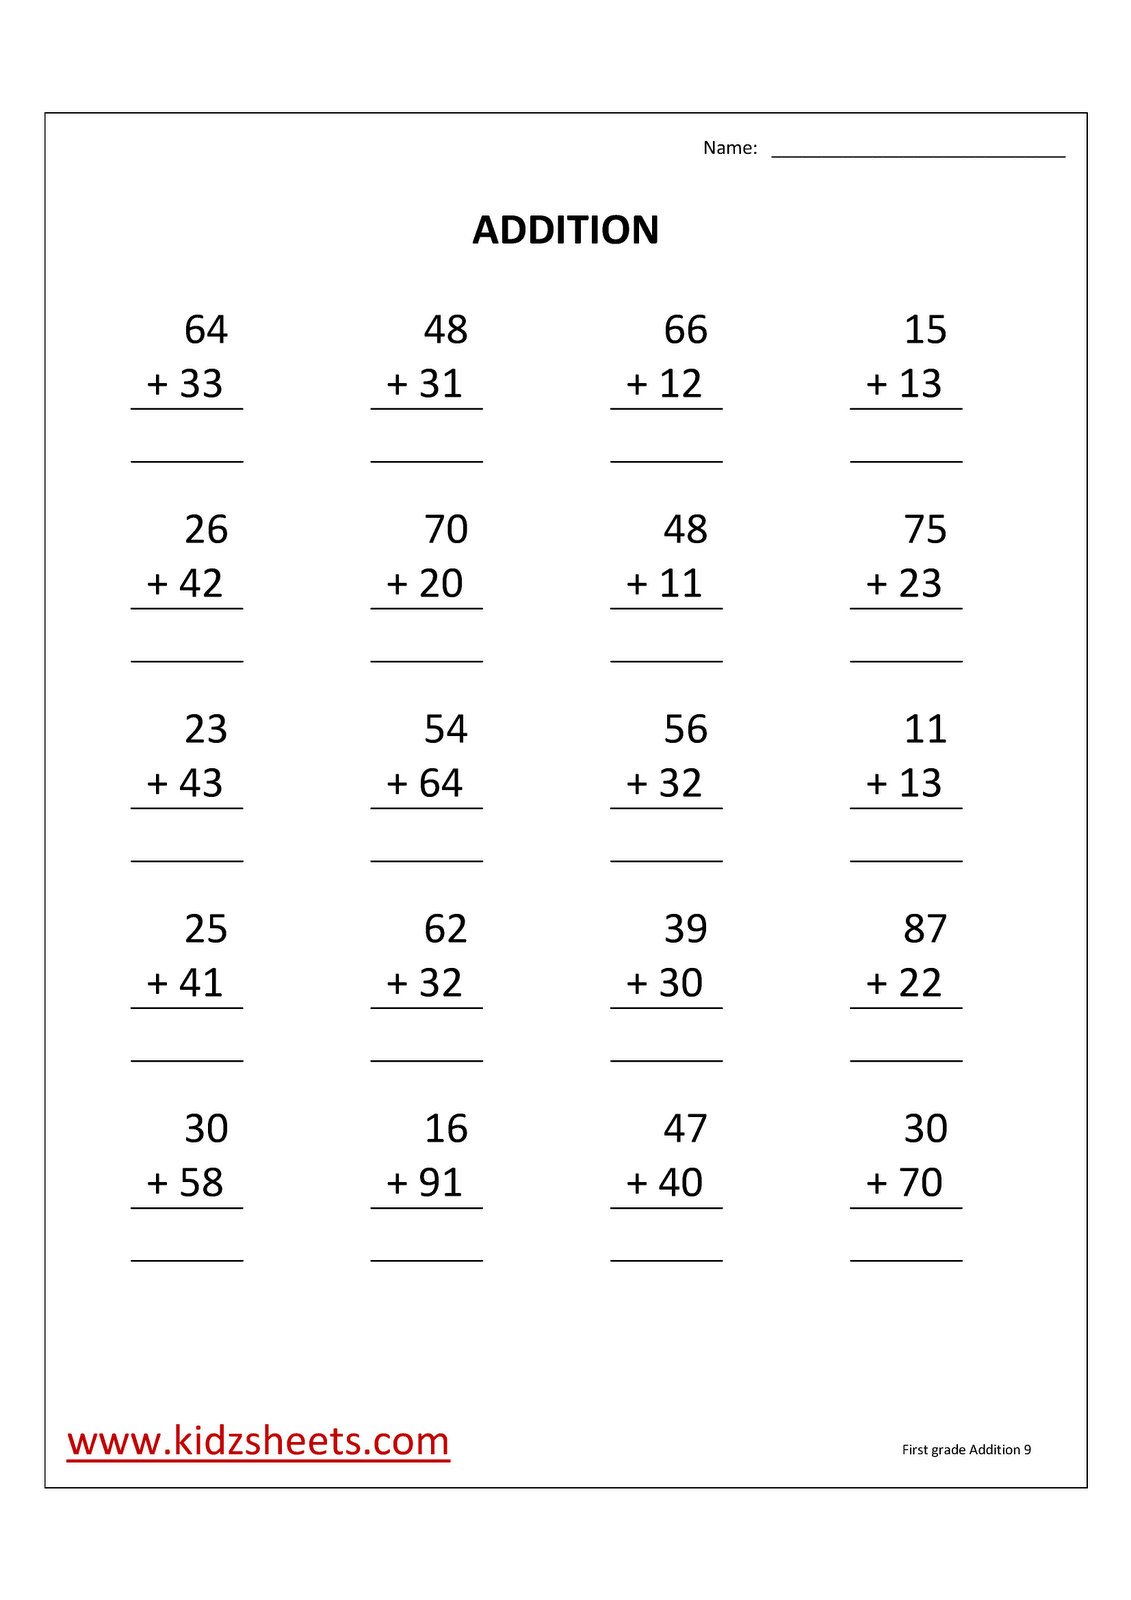 Kidz Worksheets First Grade Addition Worksheet9